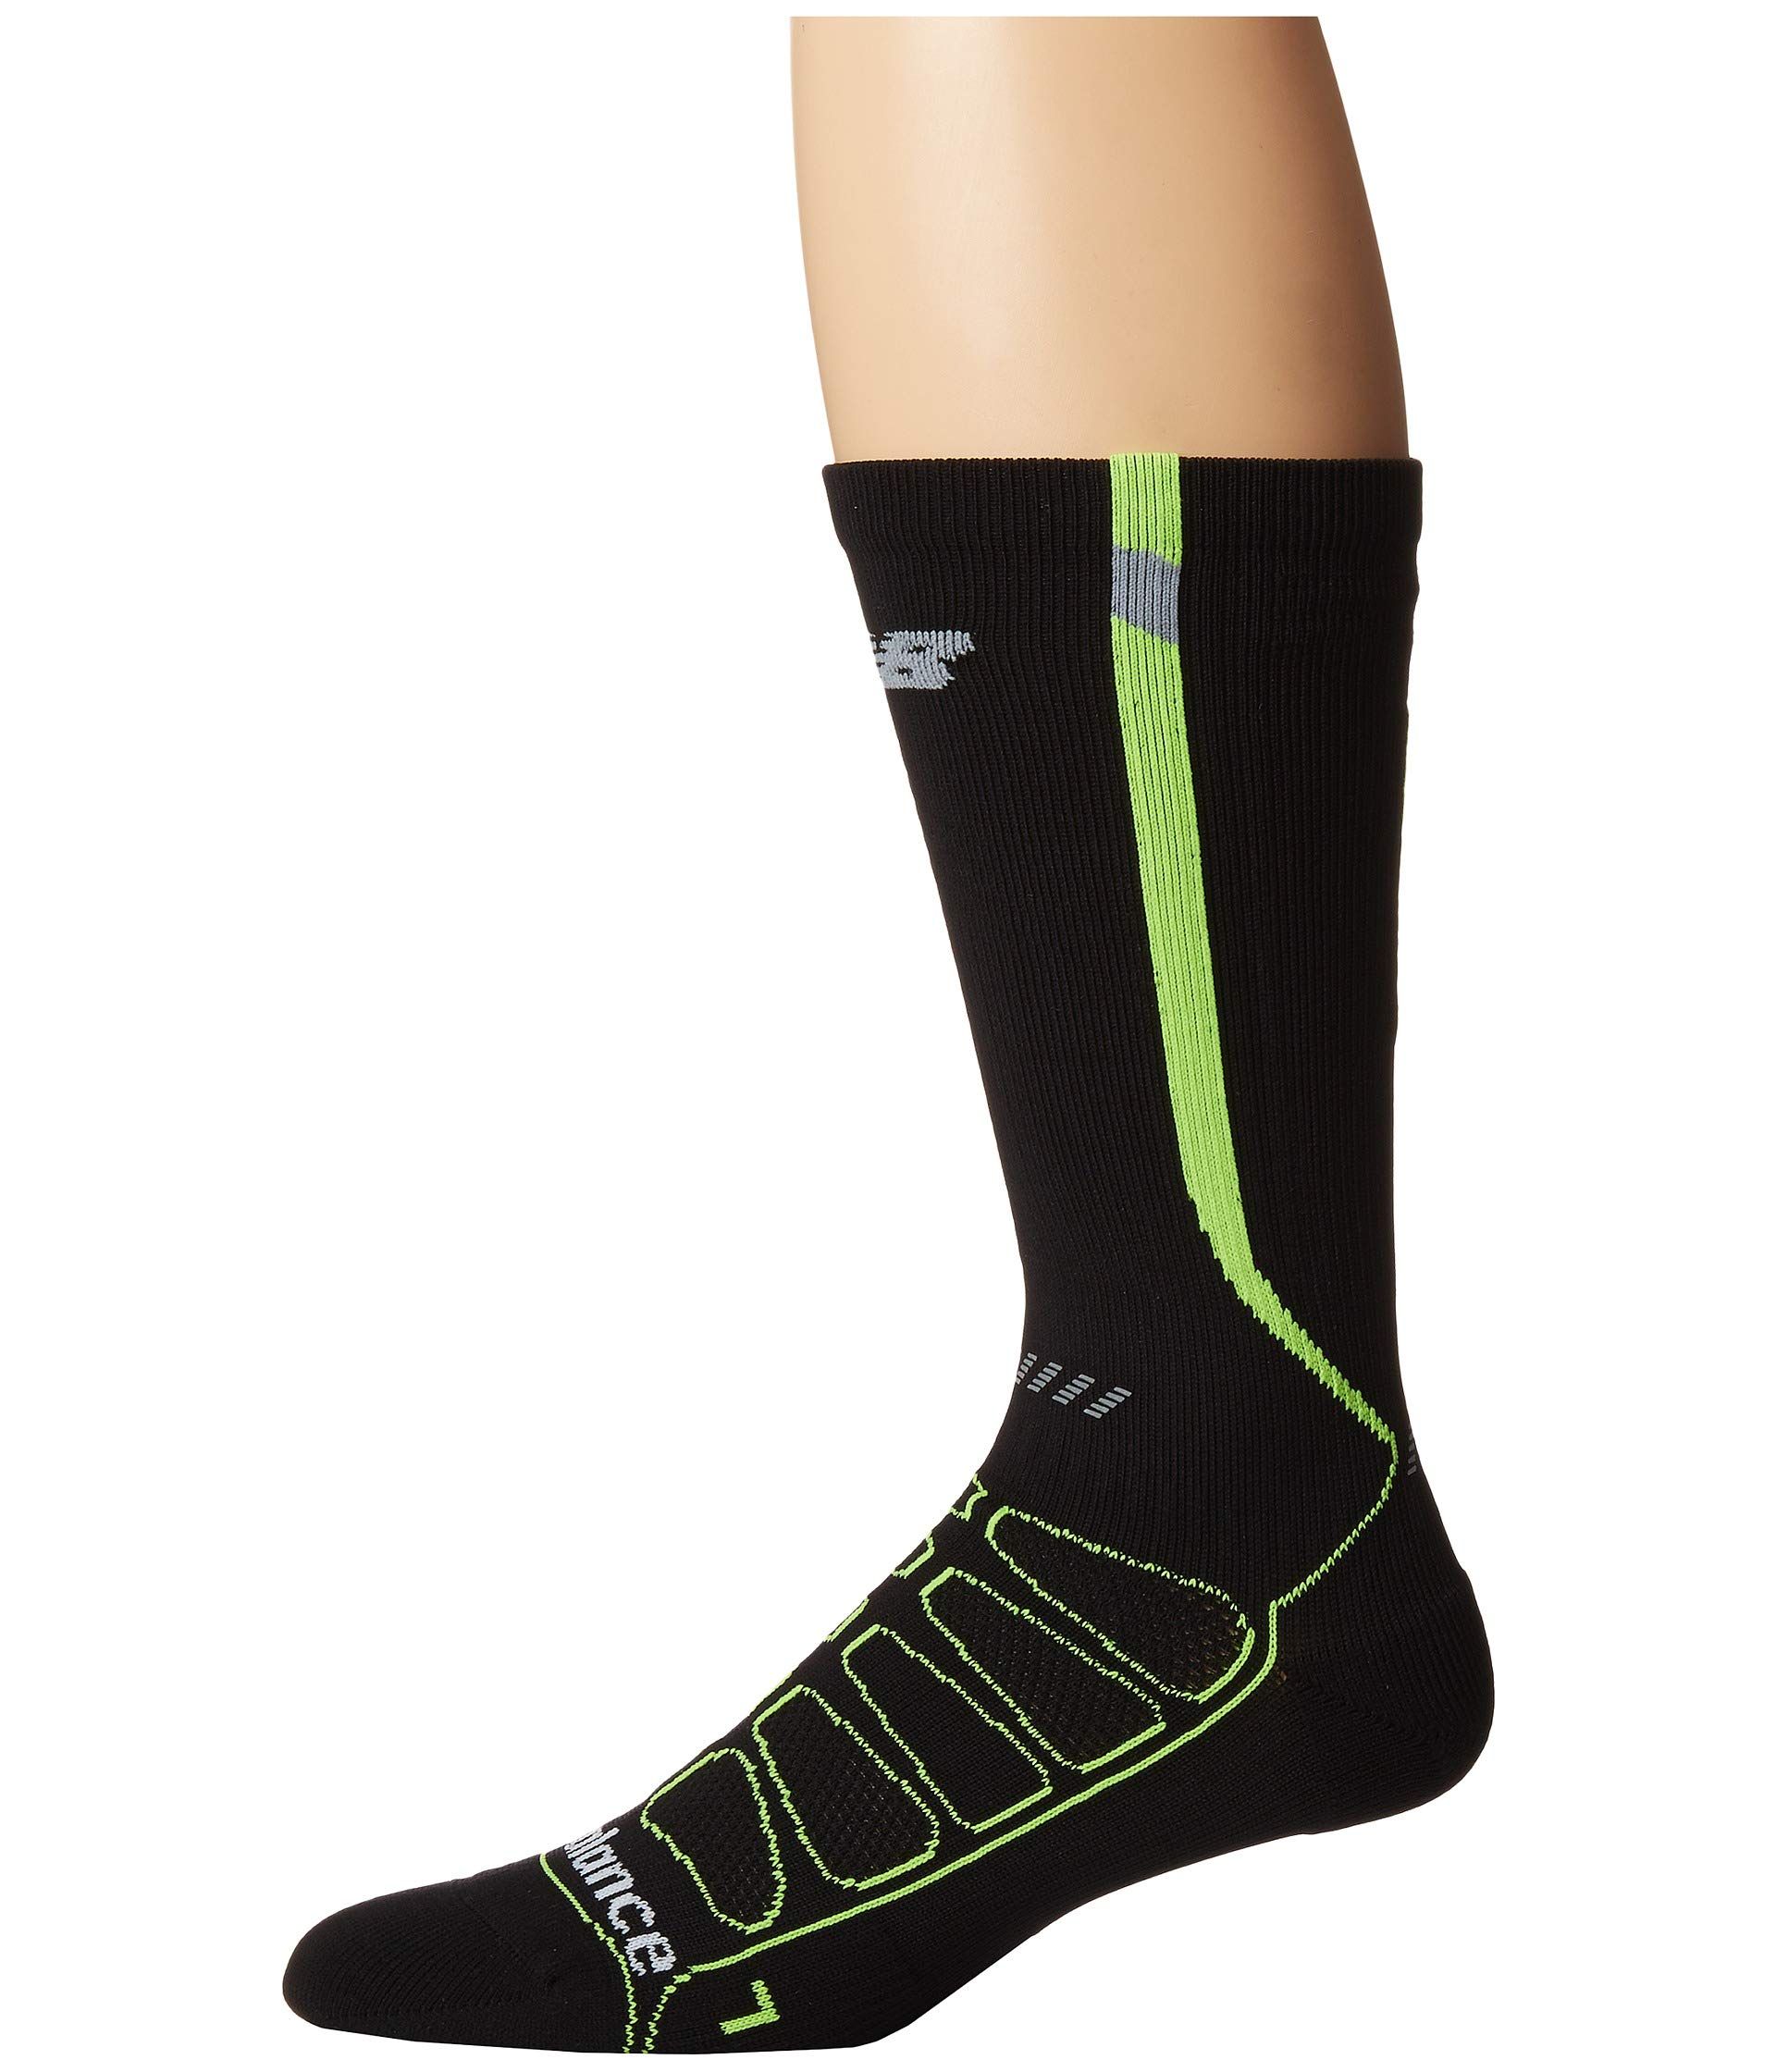 Socks Running Calf yellow Compression The Over New Black Reflective Balance wXYz0Aqt